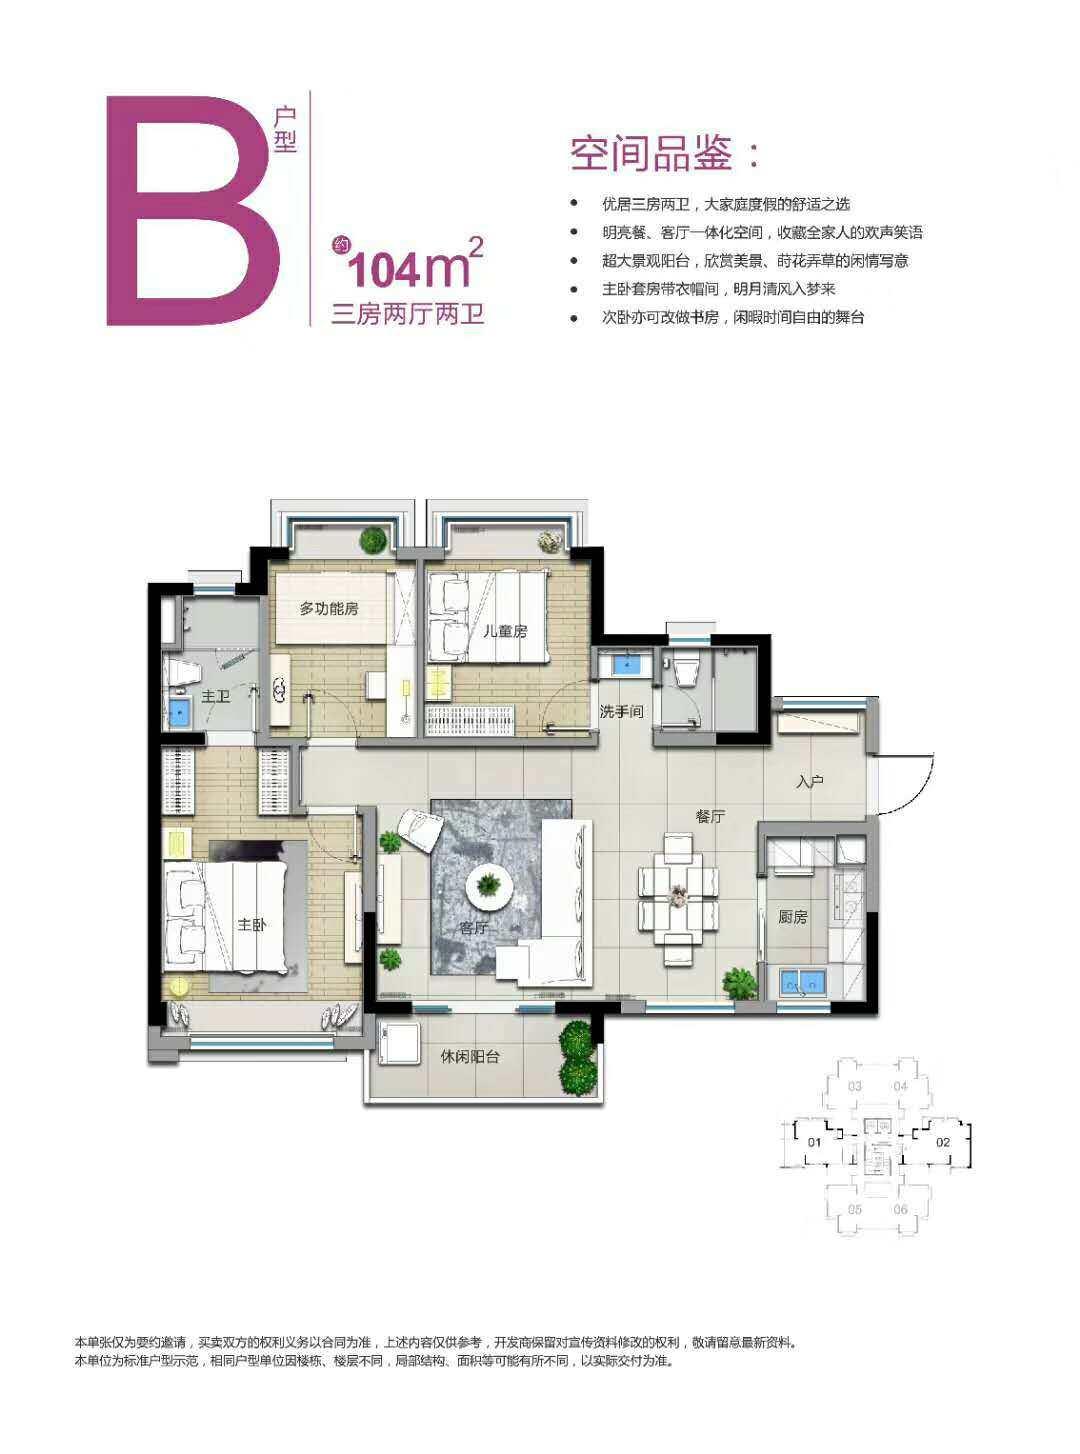 B户型 3室2厅2卫 建筑面积:104㎡